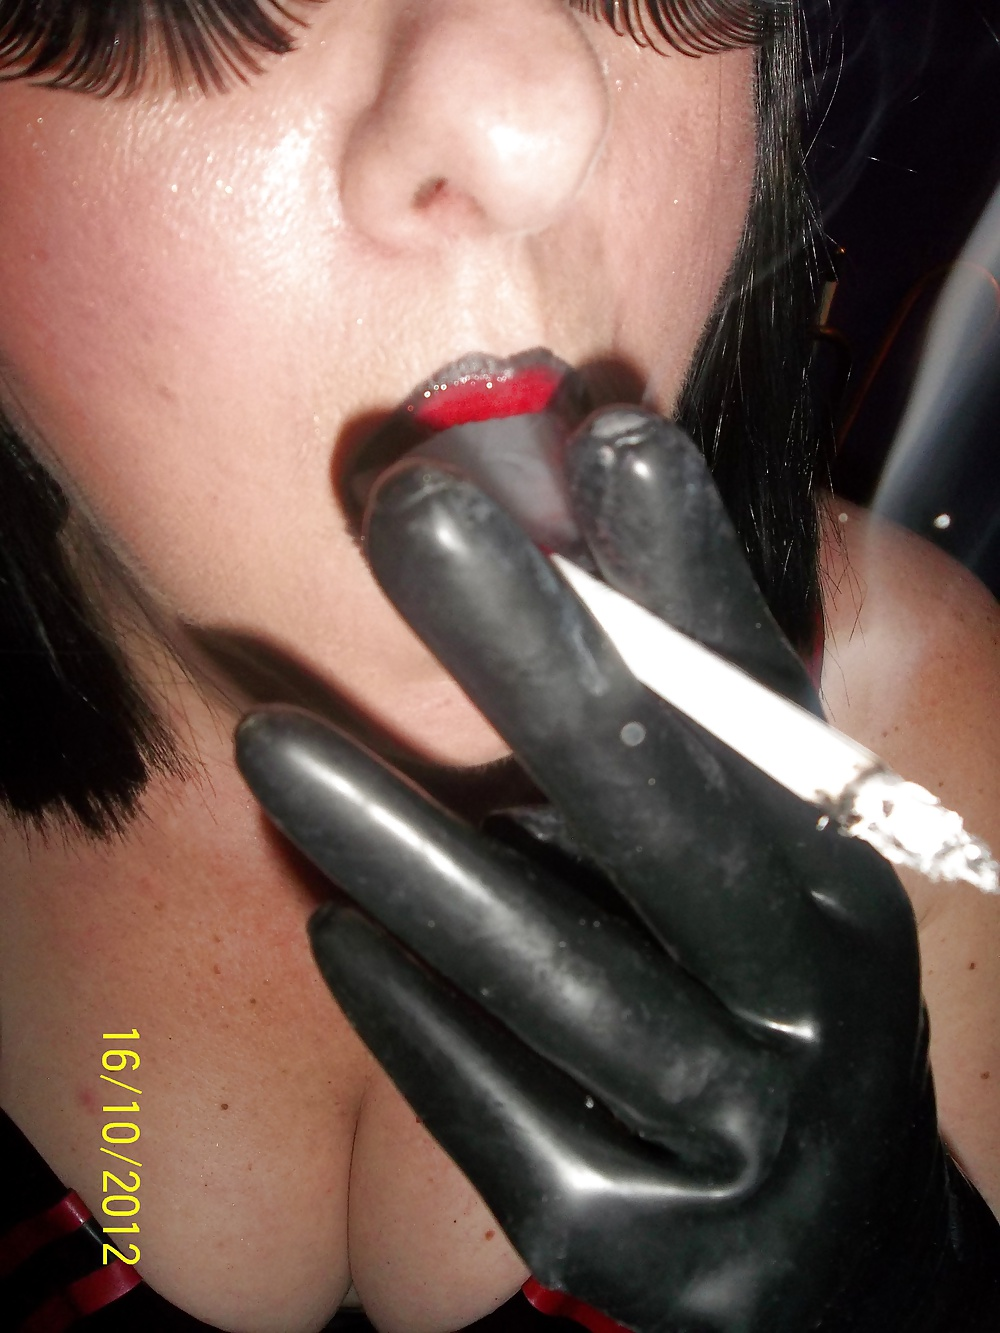 Latex hot pink rubber pig hood mask fetish play full head doll man men animal mi